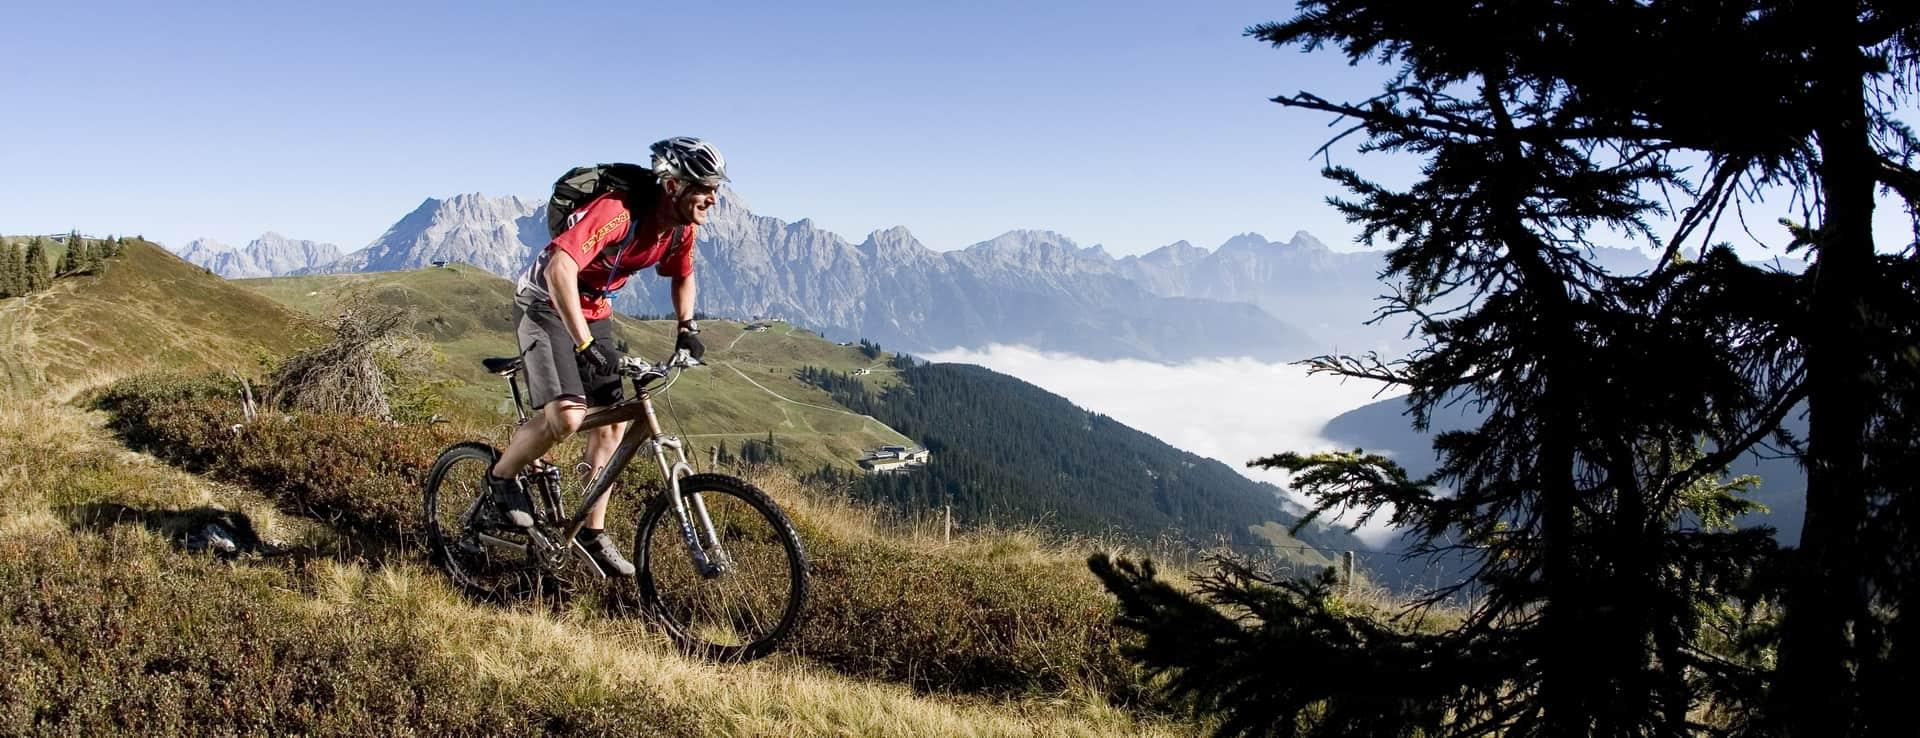 MTB Biketour King Dachstein Österrike